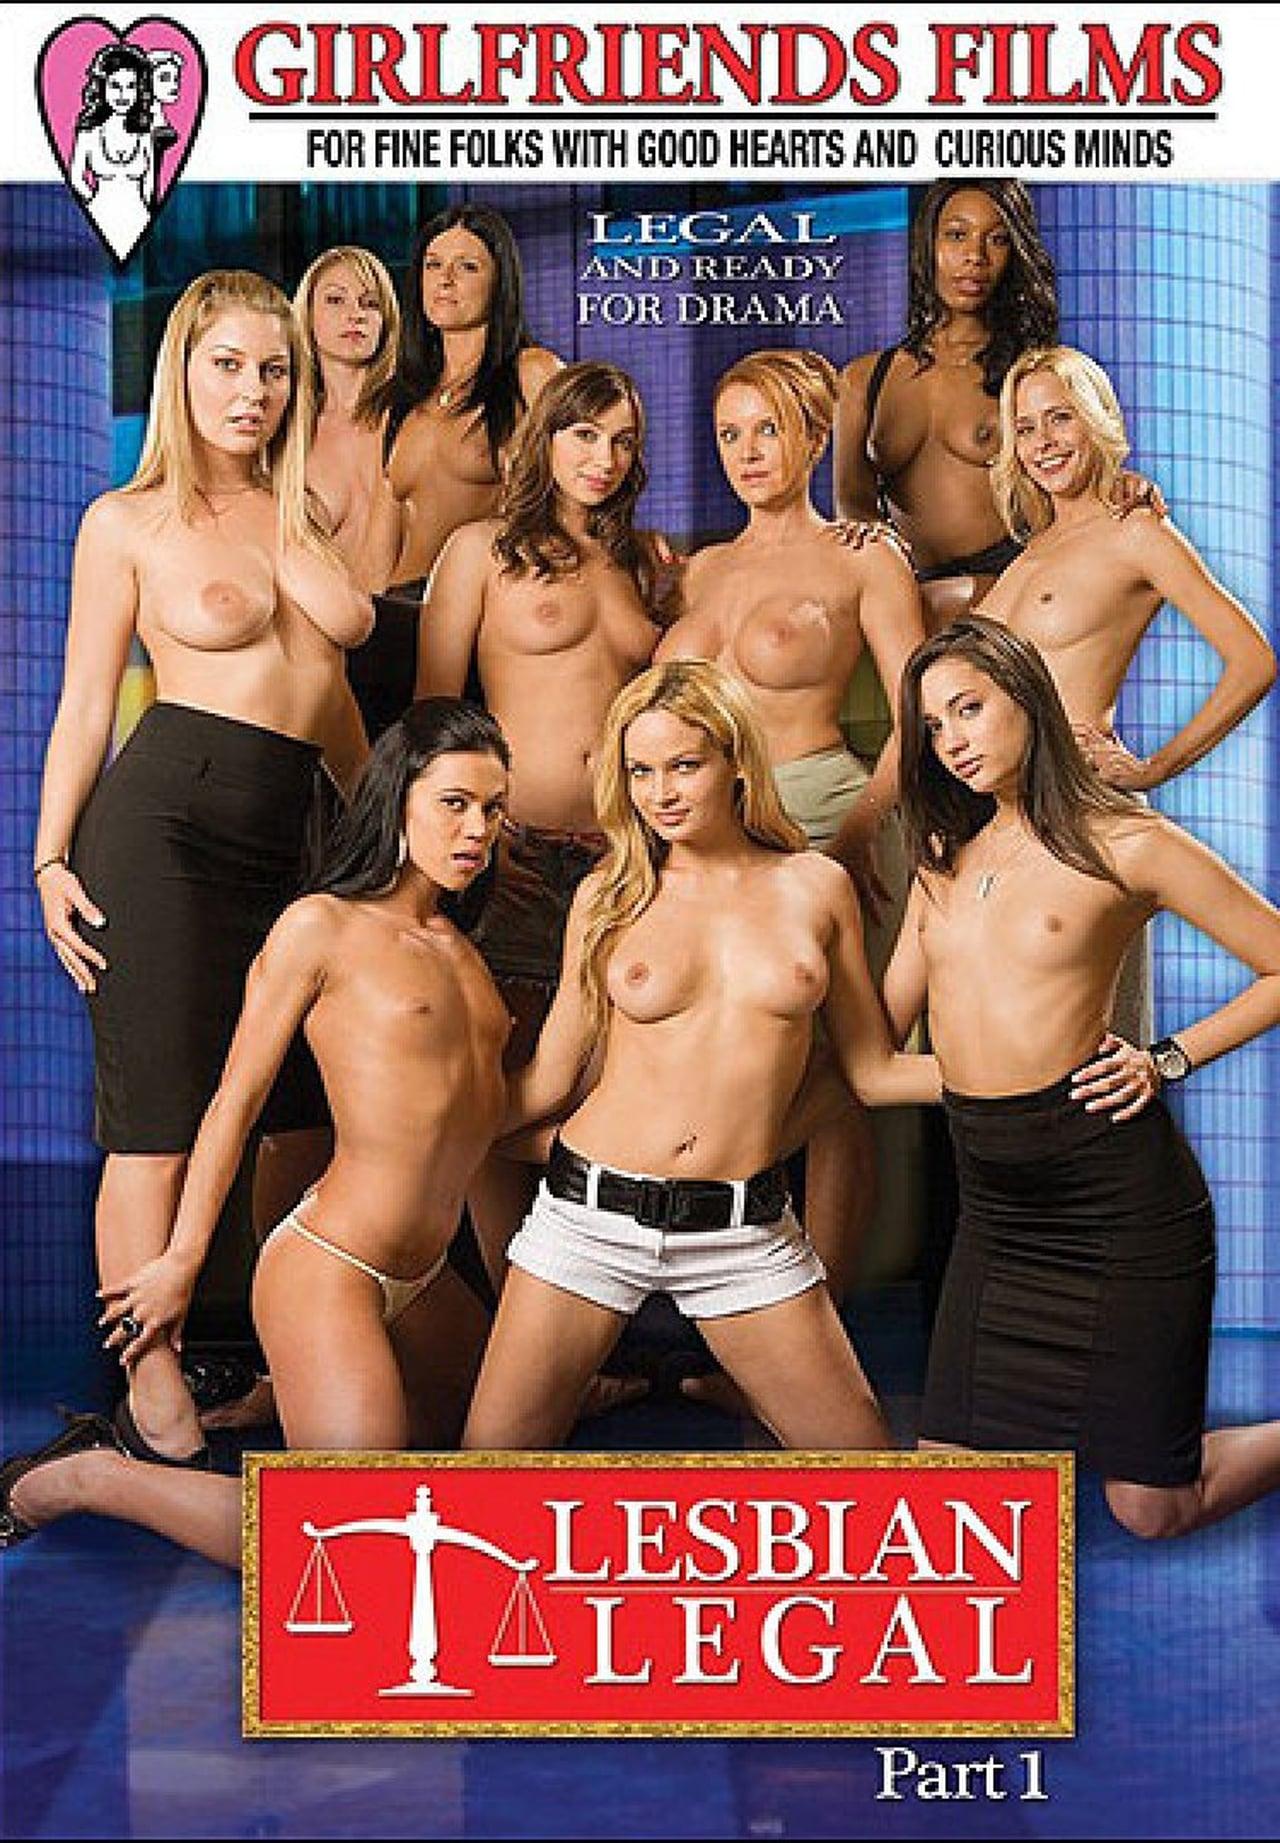 Lesbian Legal